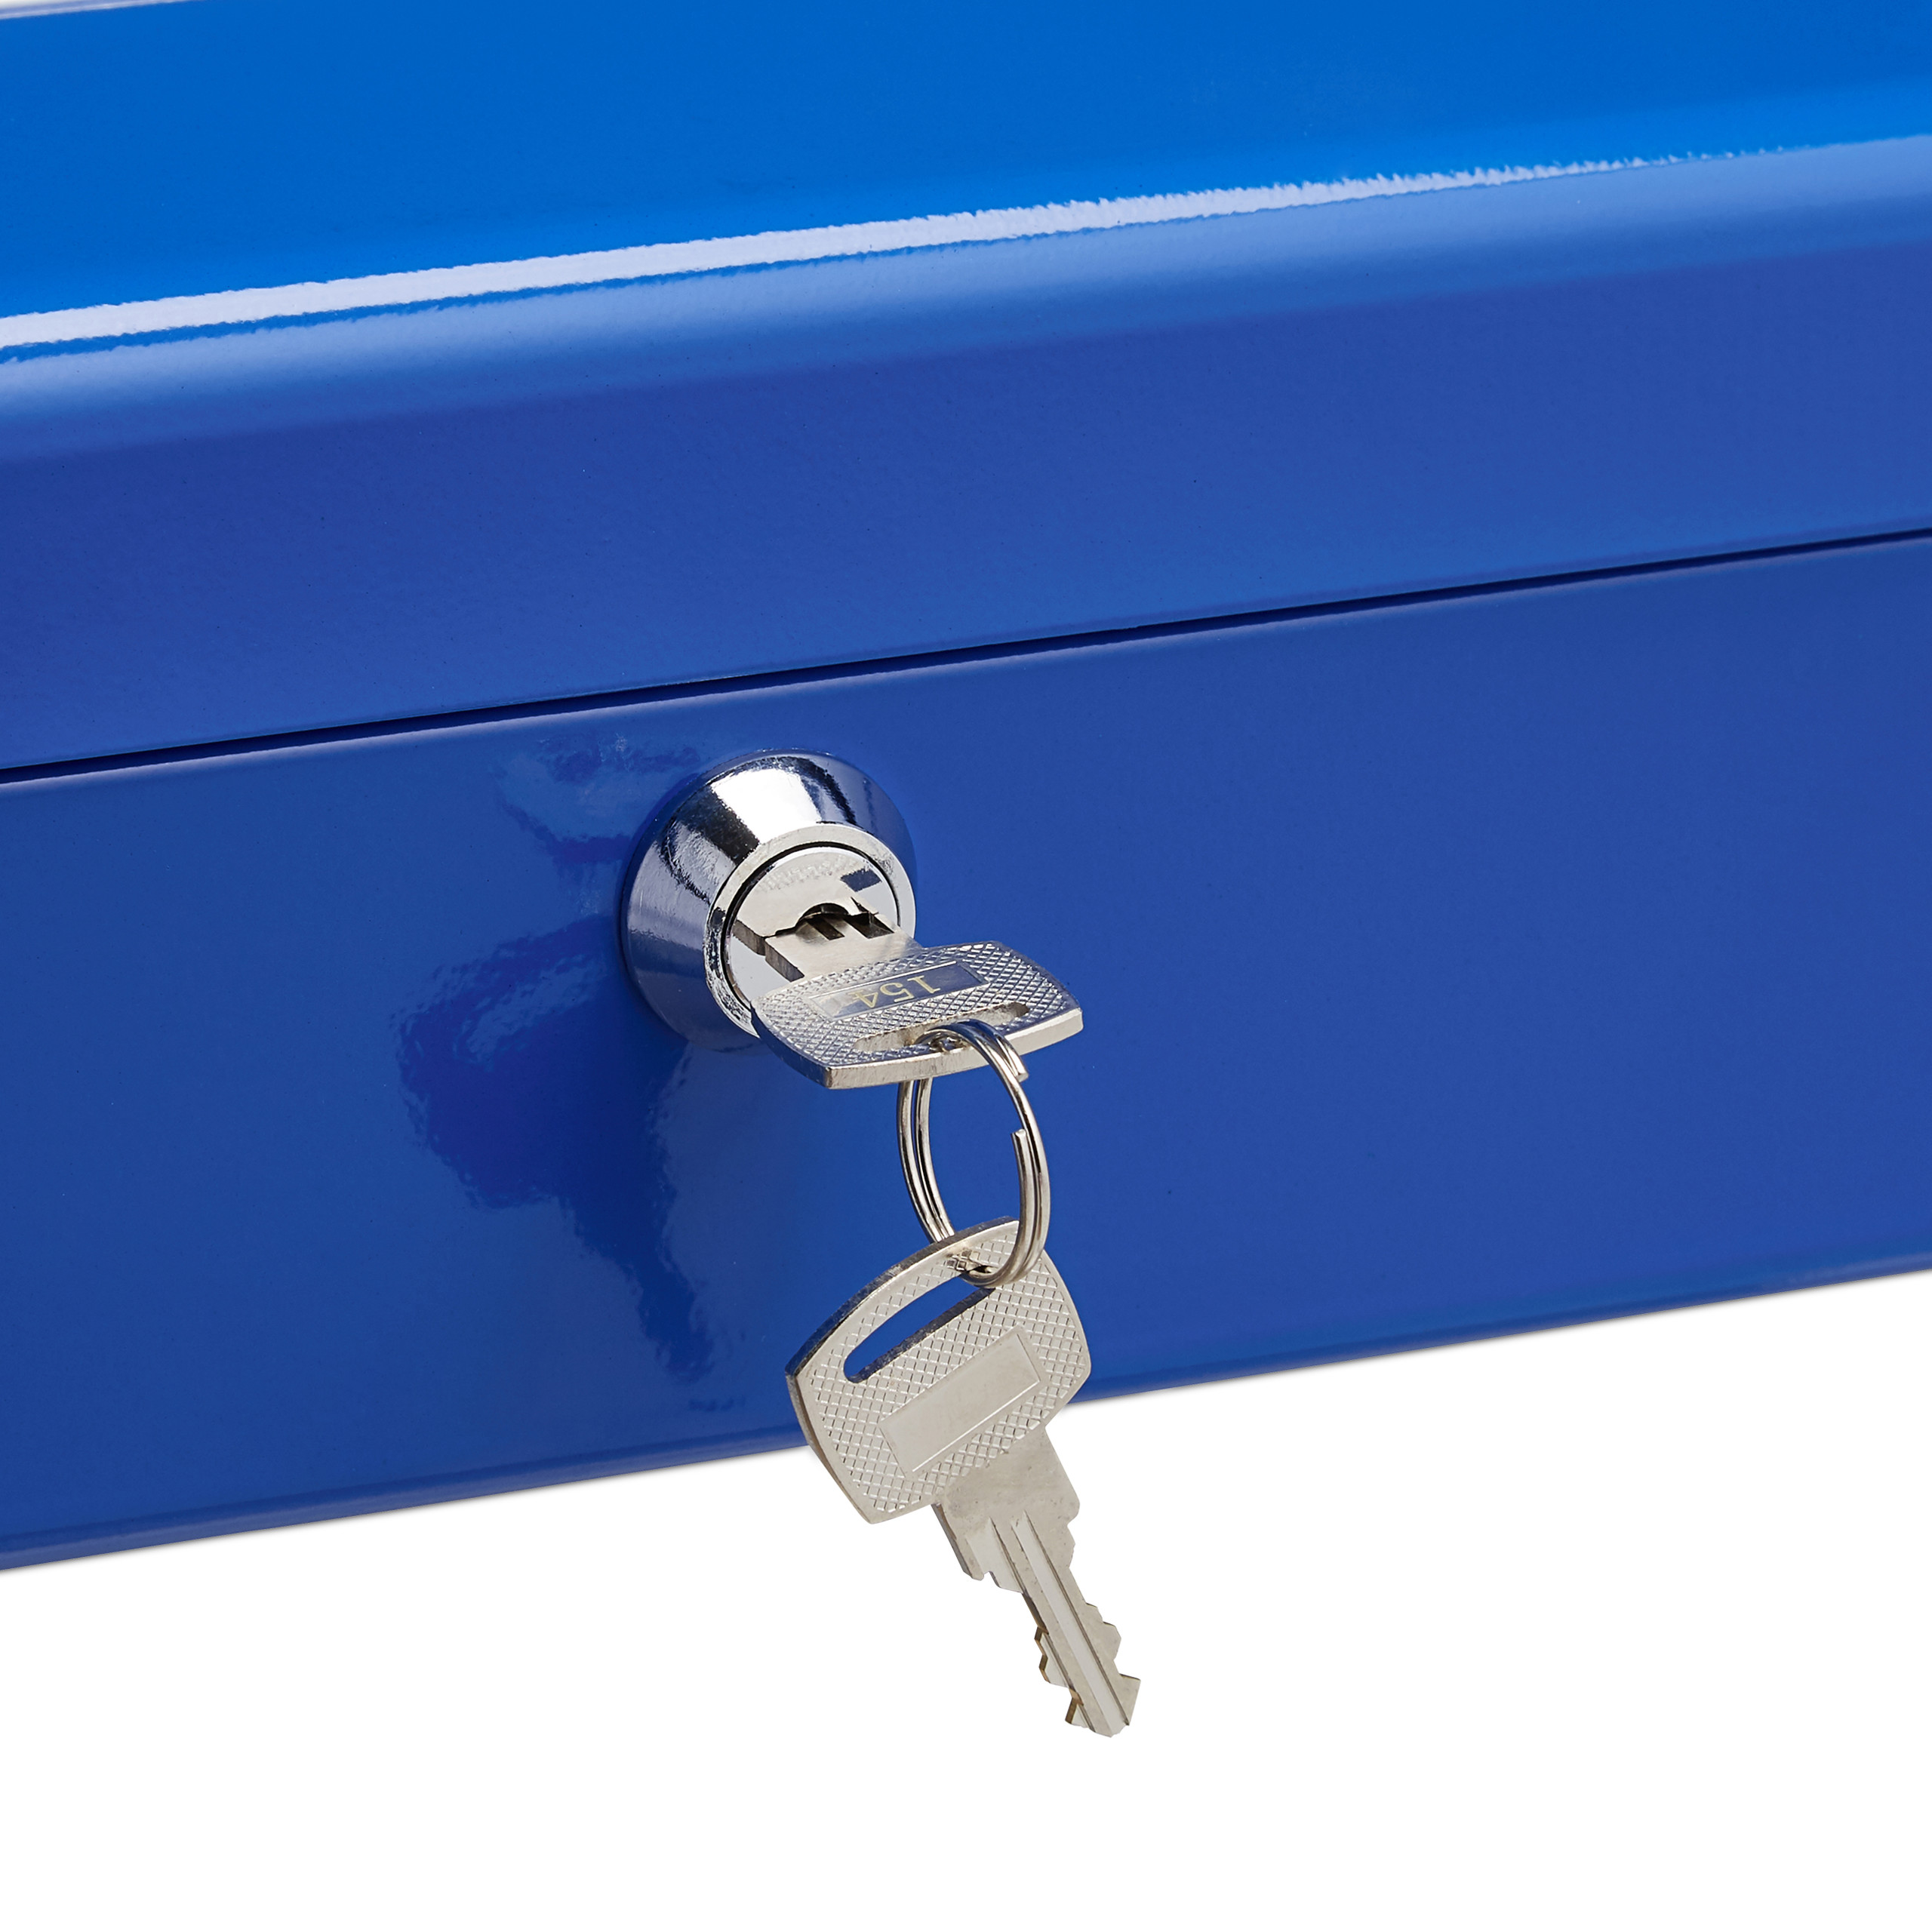 Lockable-Cash-Box-Large-Locking-Money-Box-with-2-Keys-Metal-Case-Safe thumbnail 15